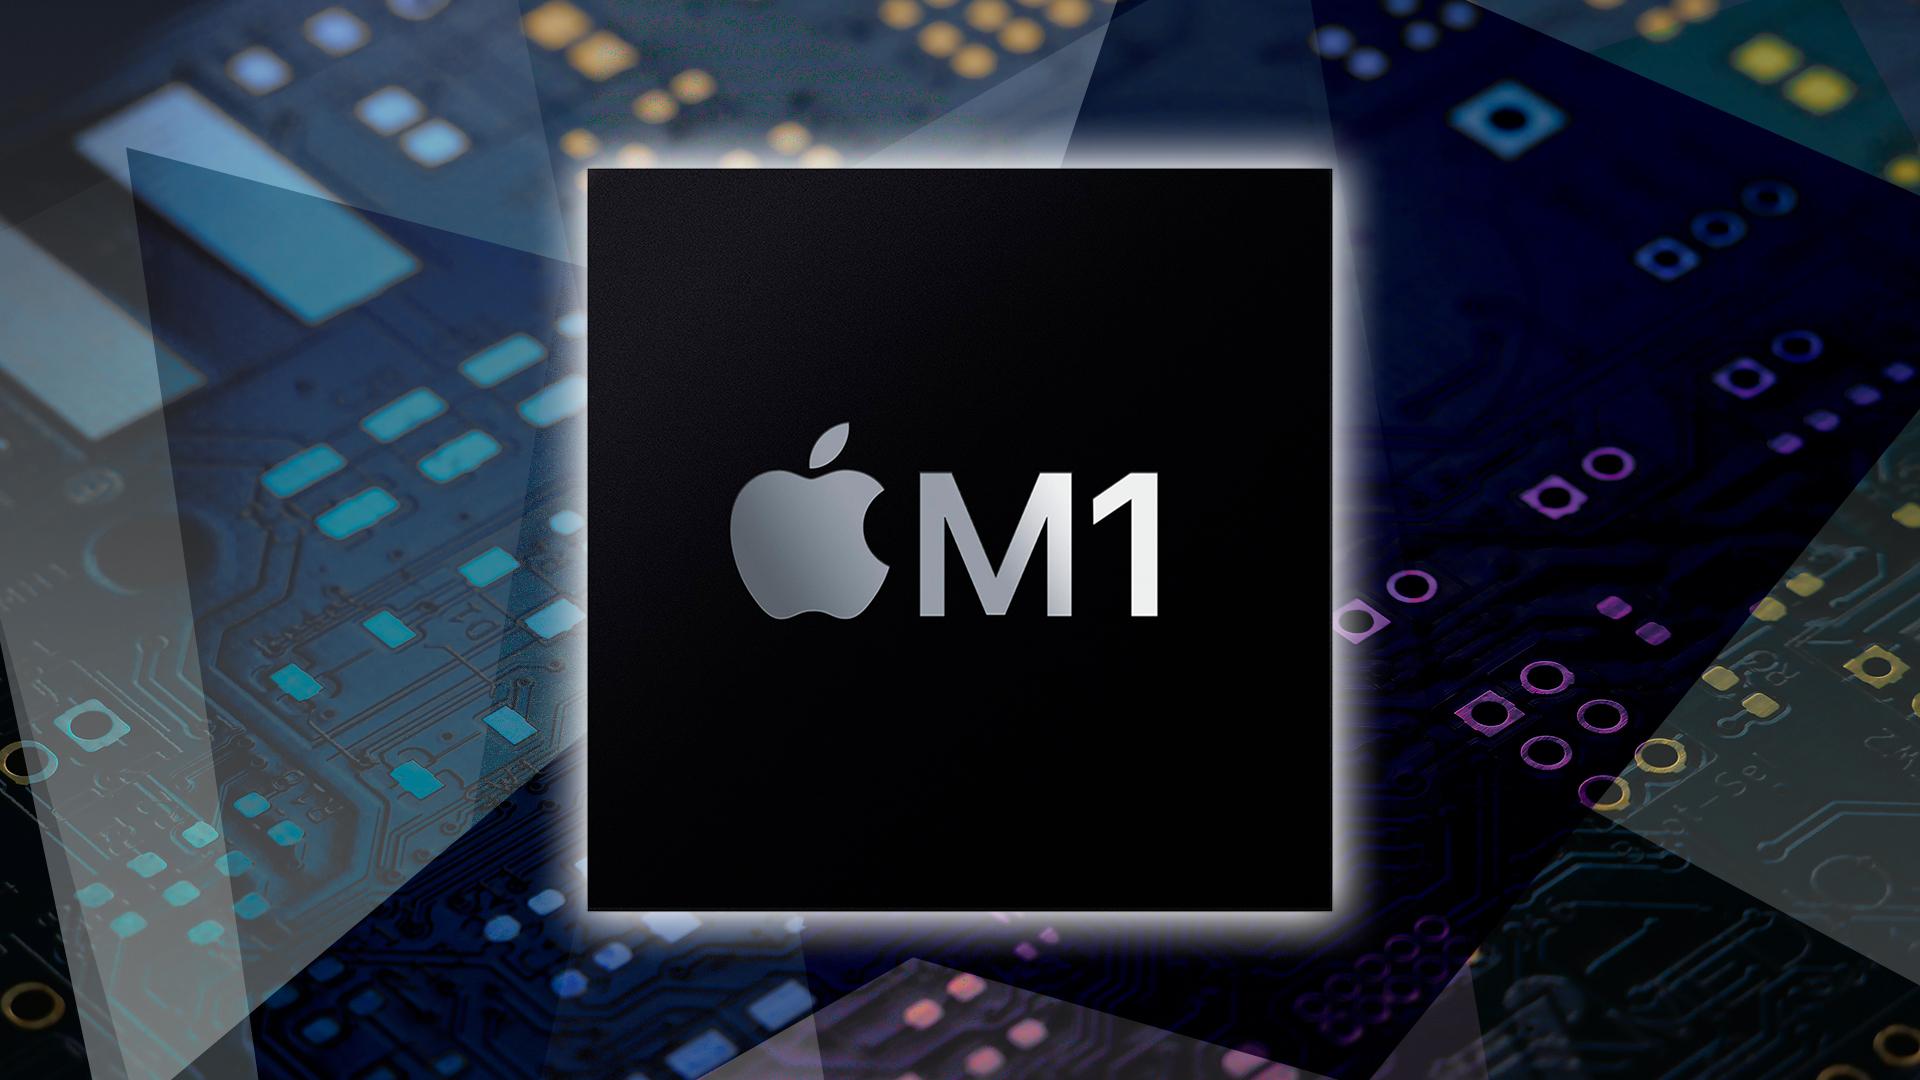 Apple, Logo, Prozessor, Cpu, Chip, SoC, Arm, Prozessoren, Apple Logo, M1, Apple M1, M1 Chip, Apple M1 Chip, Apple Chip, M1 Arm, Apple ARM, Arm Chip, Apple Arm Chip